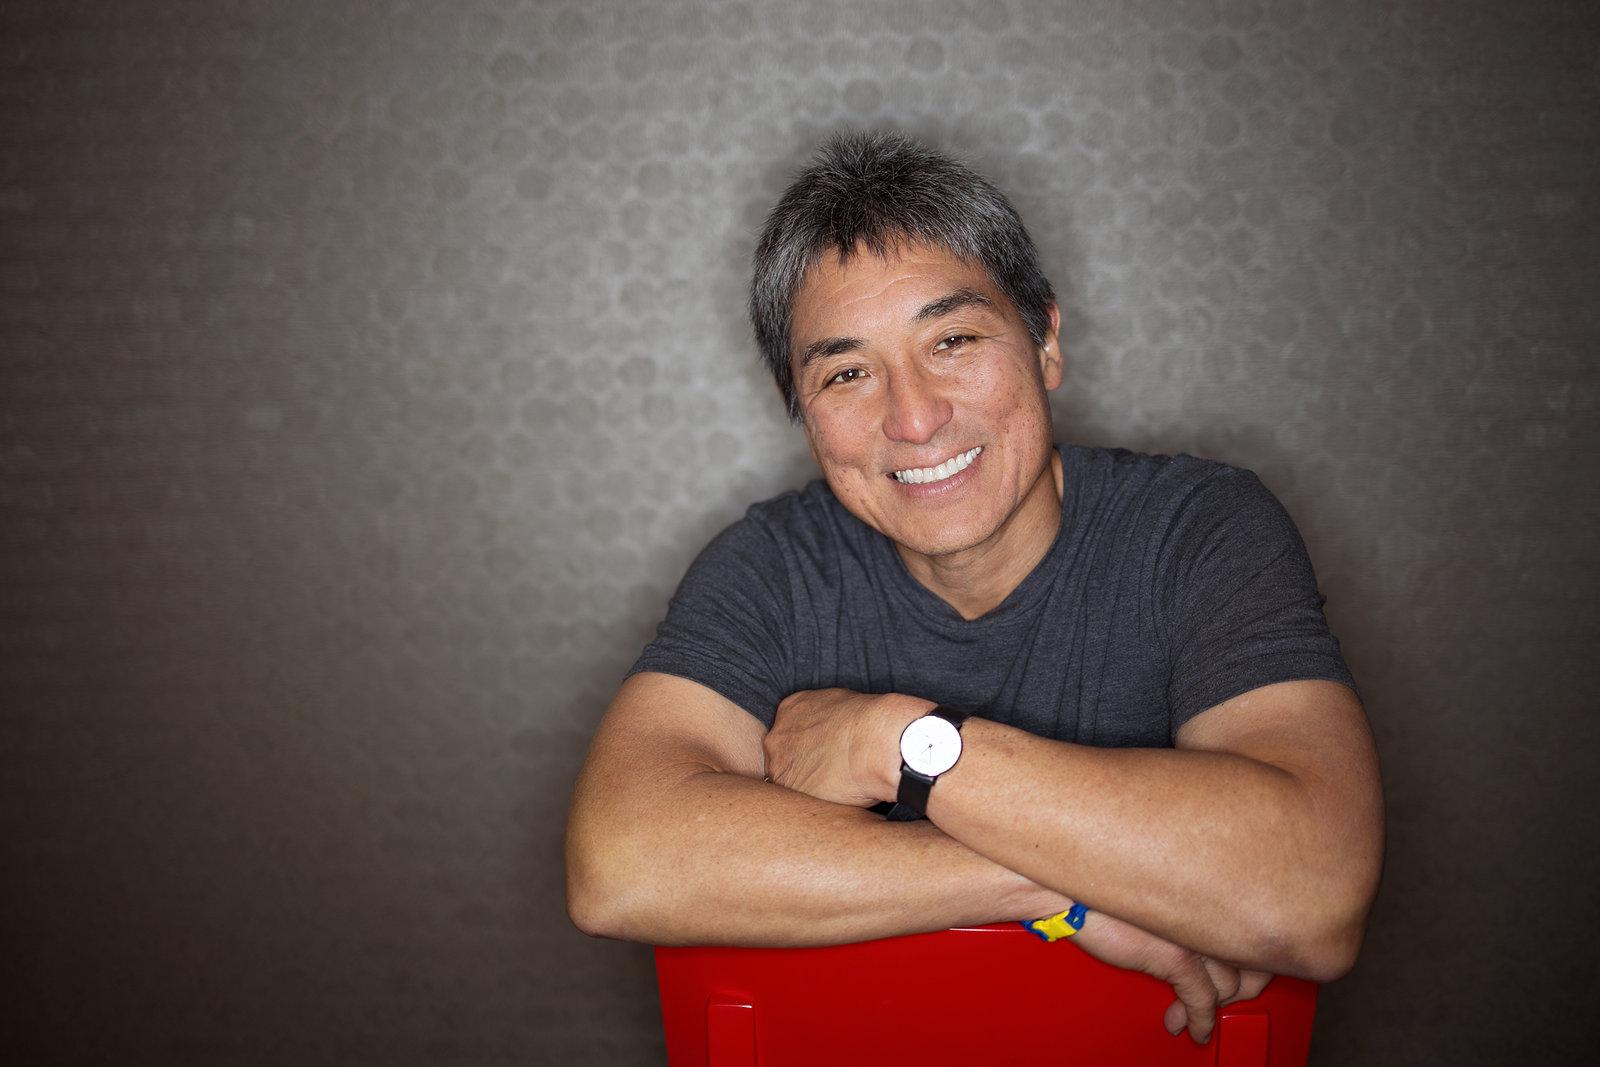 Гай Кавасаки: мастер-класс по венчурному инвестированию